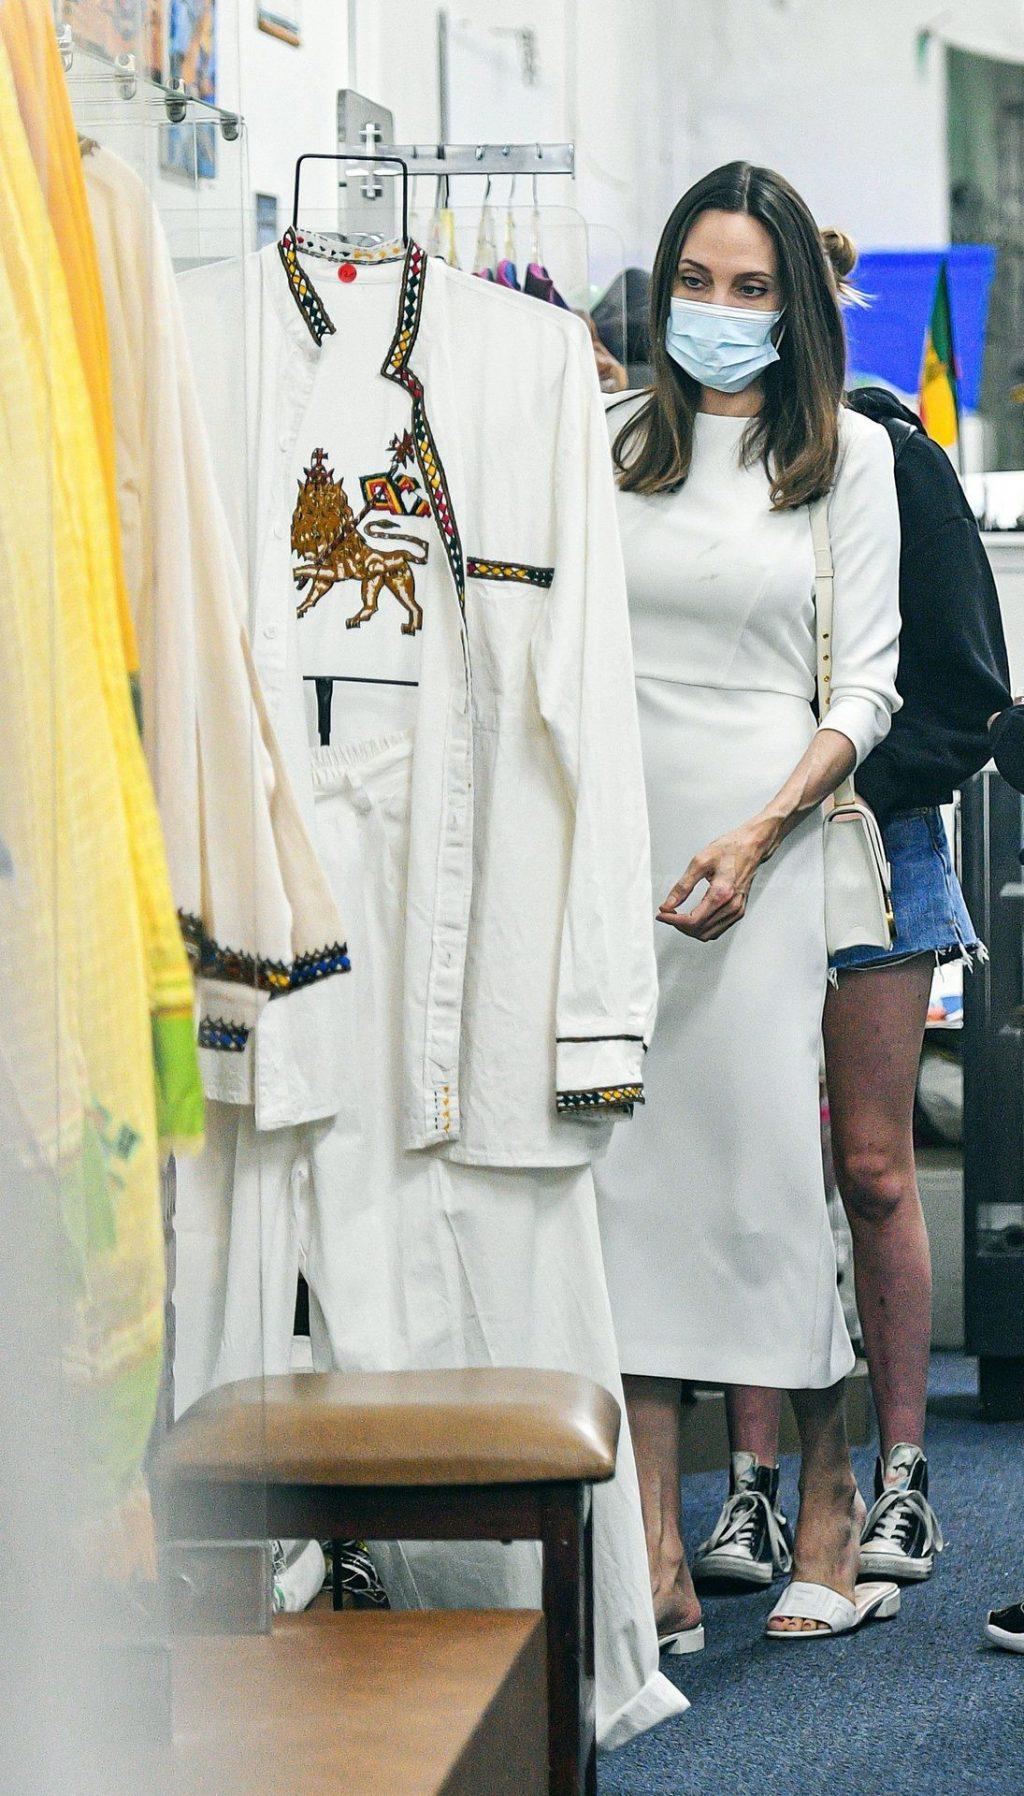 Angelina Jolie Shops at an Ethiopian Boutique Store in LA (73 Photos)